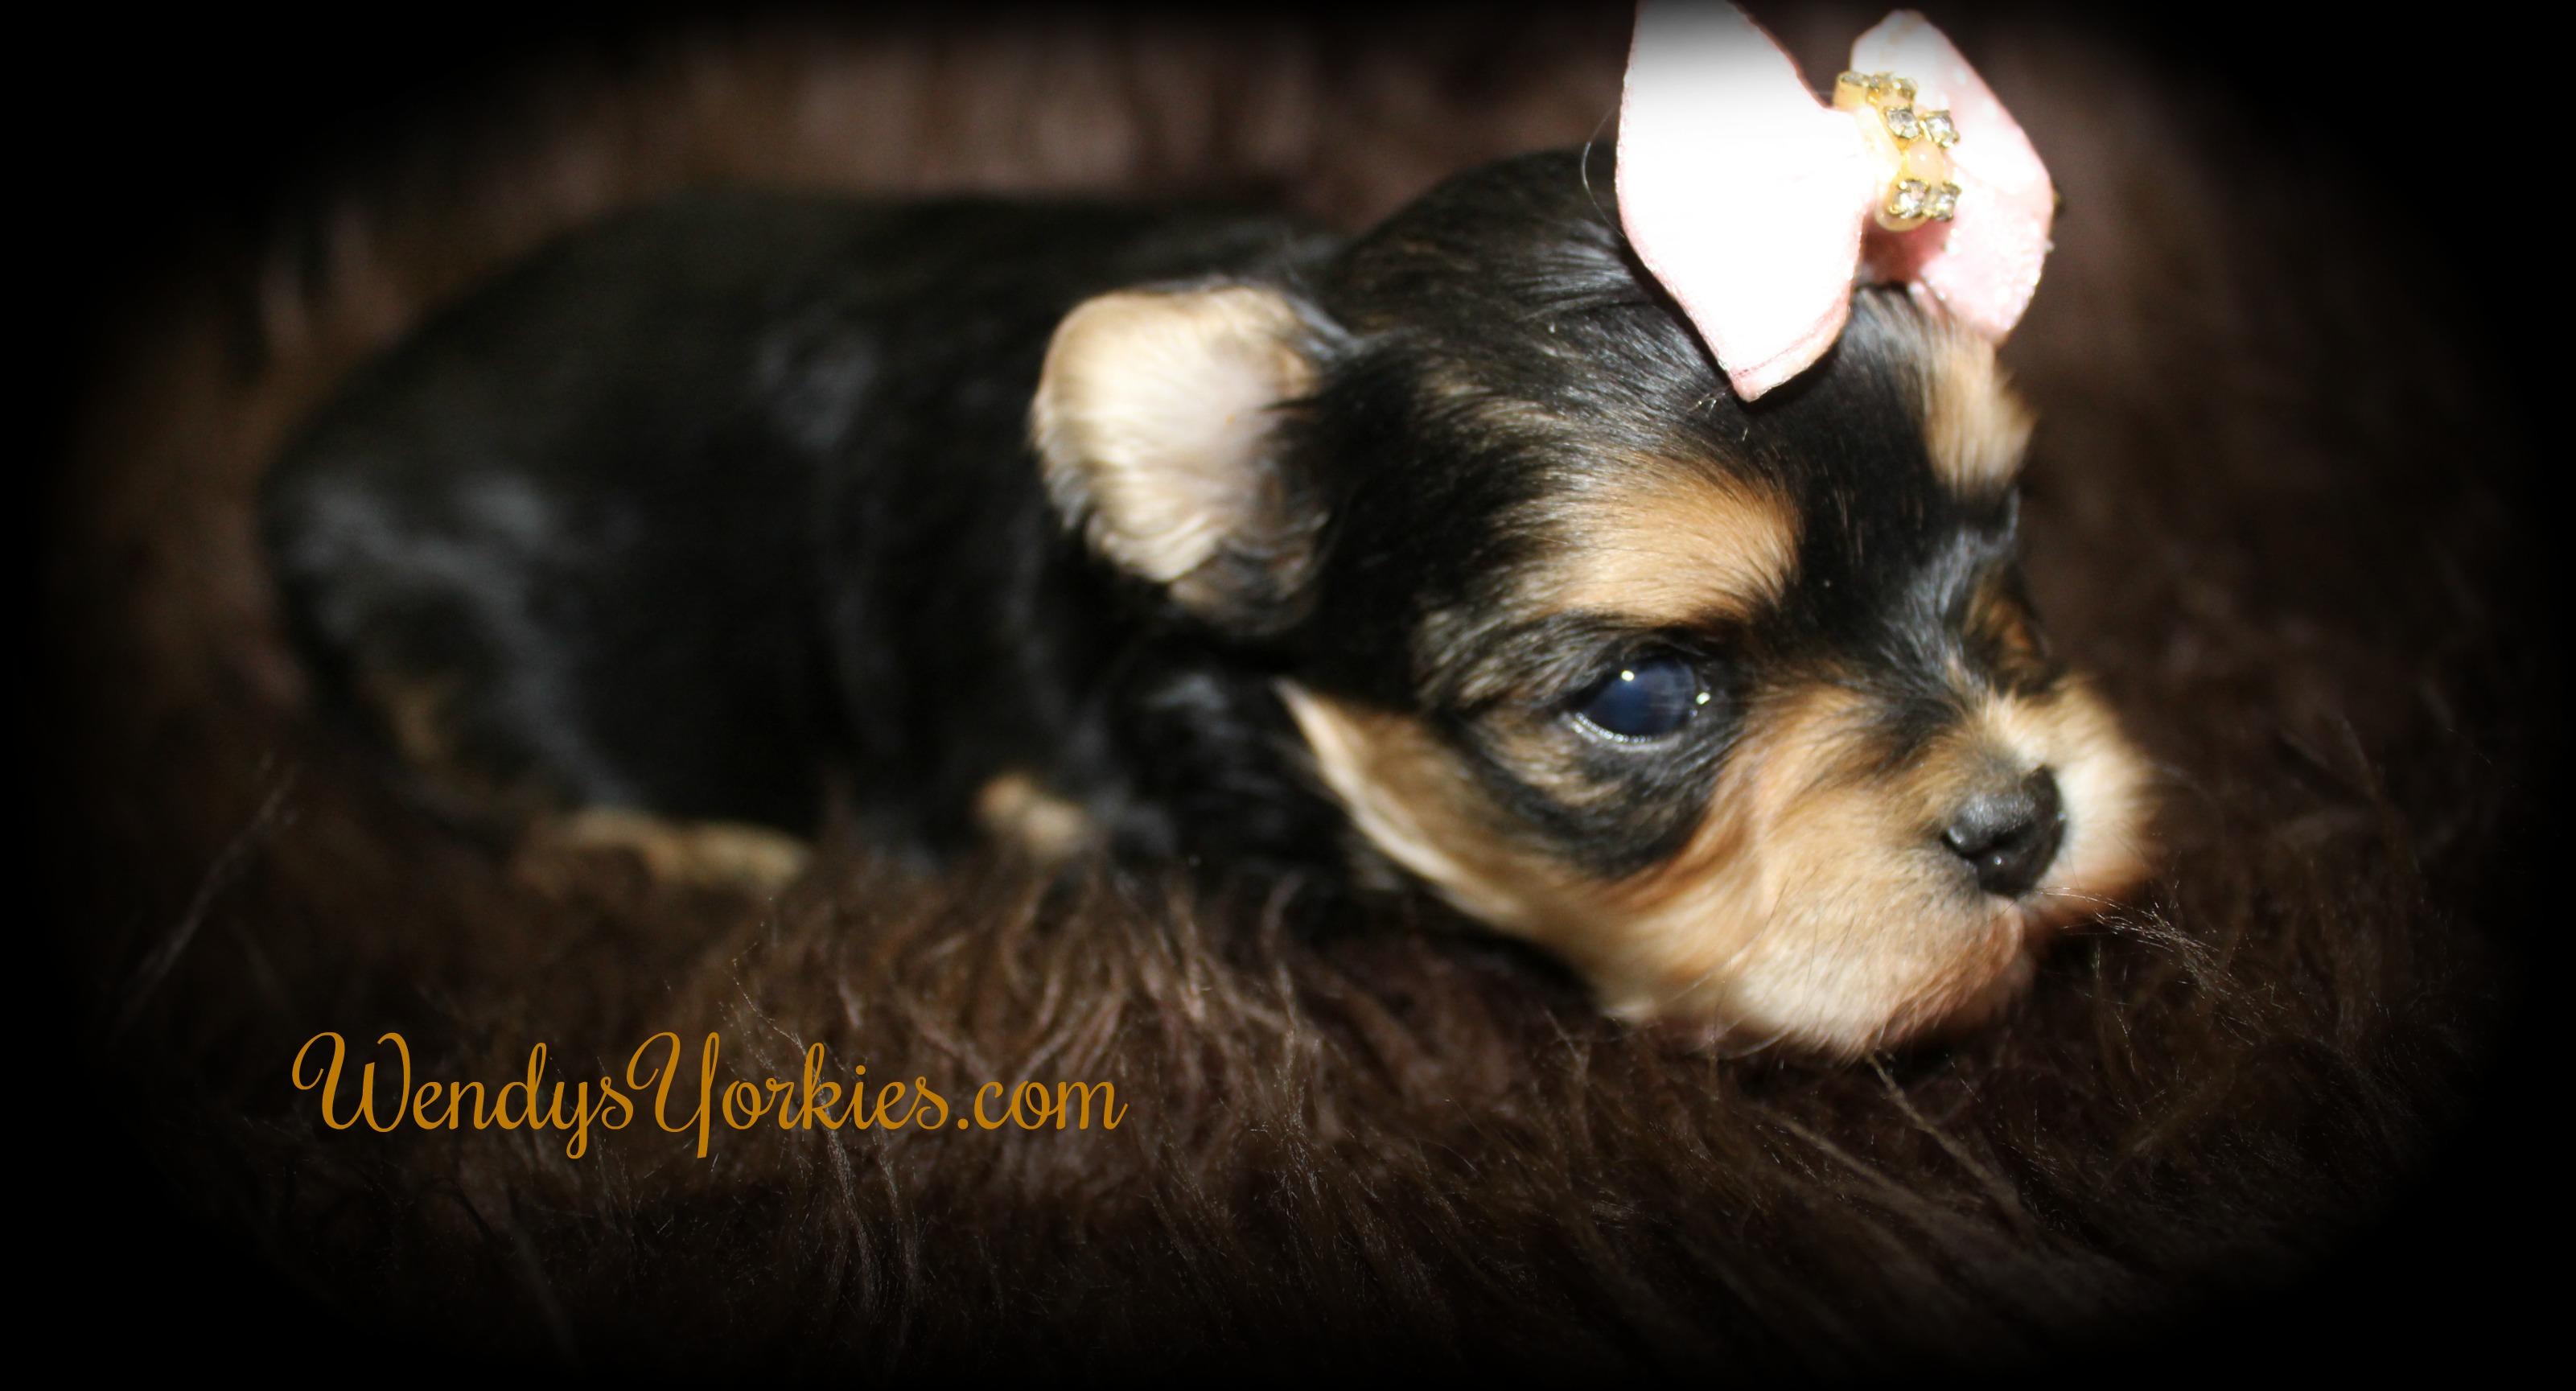 Female Morkie puppy for sale, WendysYorkies.com, Tri female Morkie